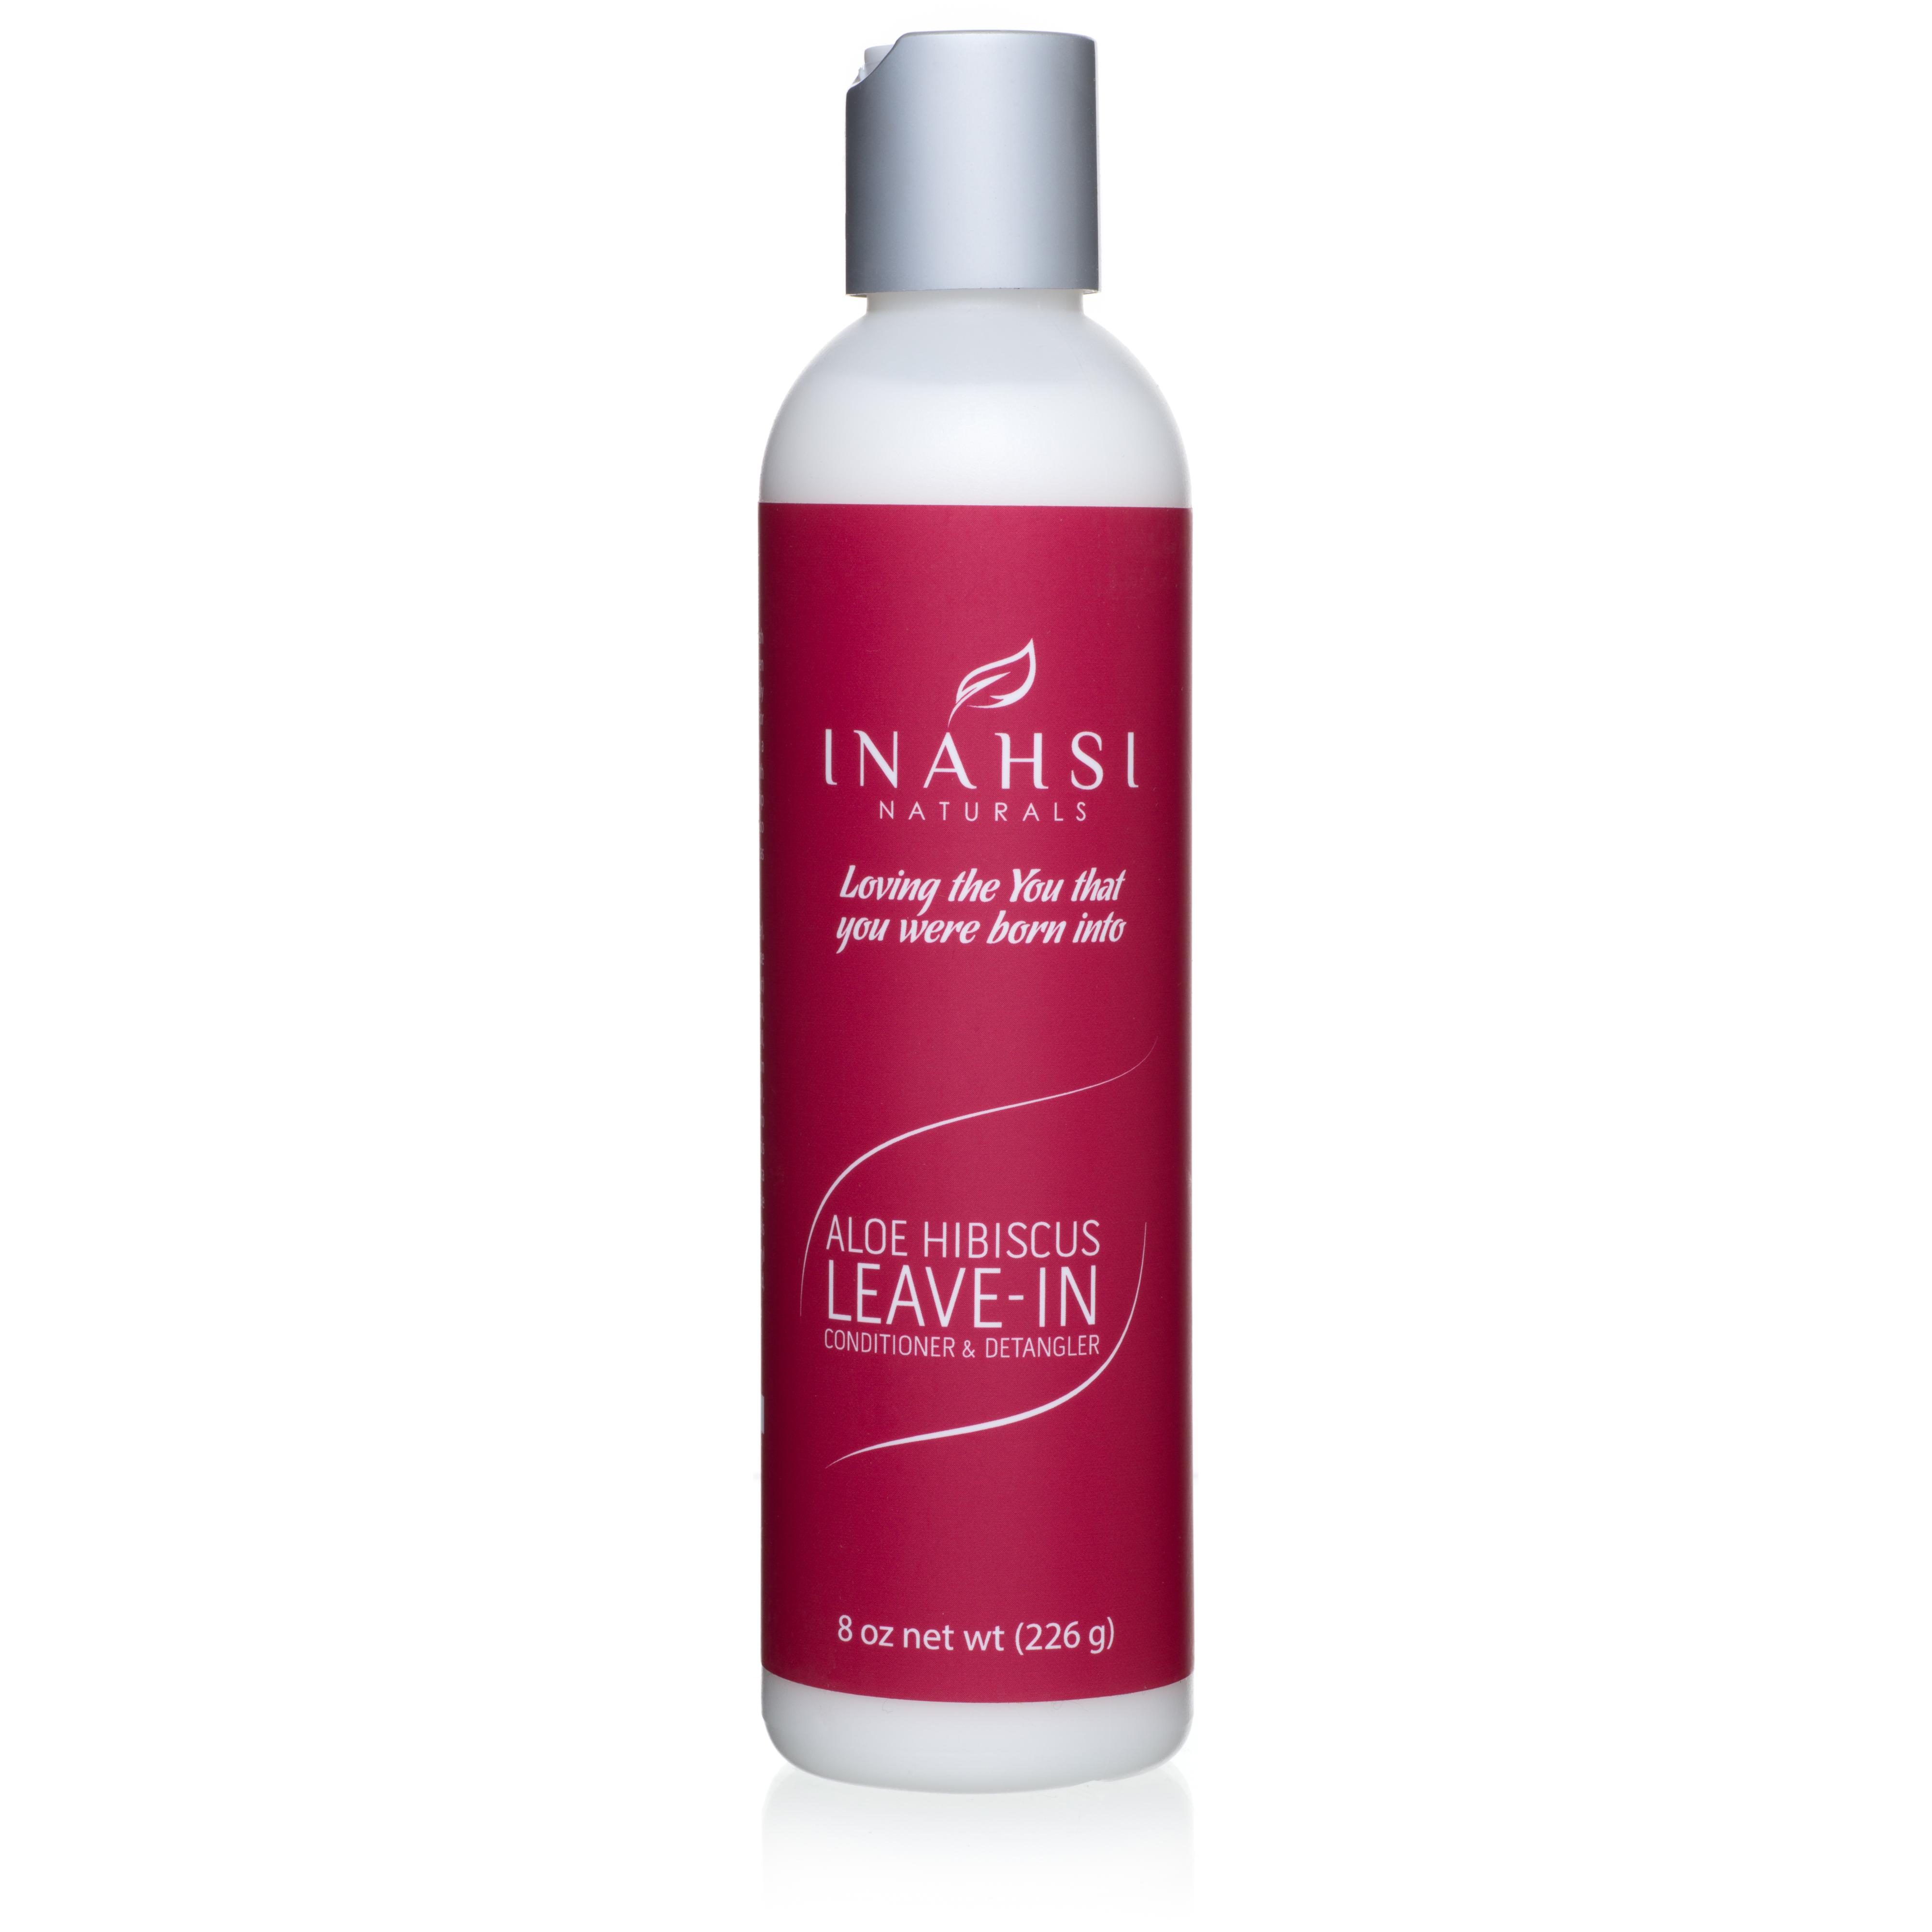 Inahsi Naturals Leave-In